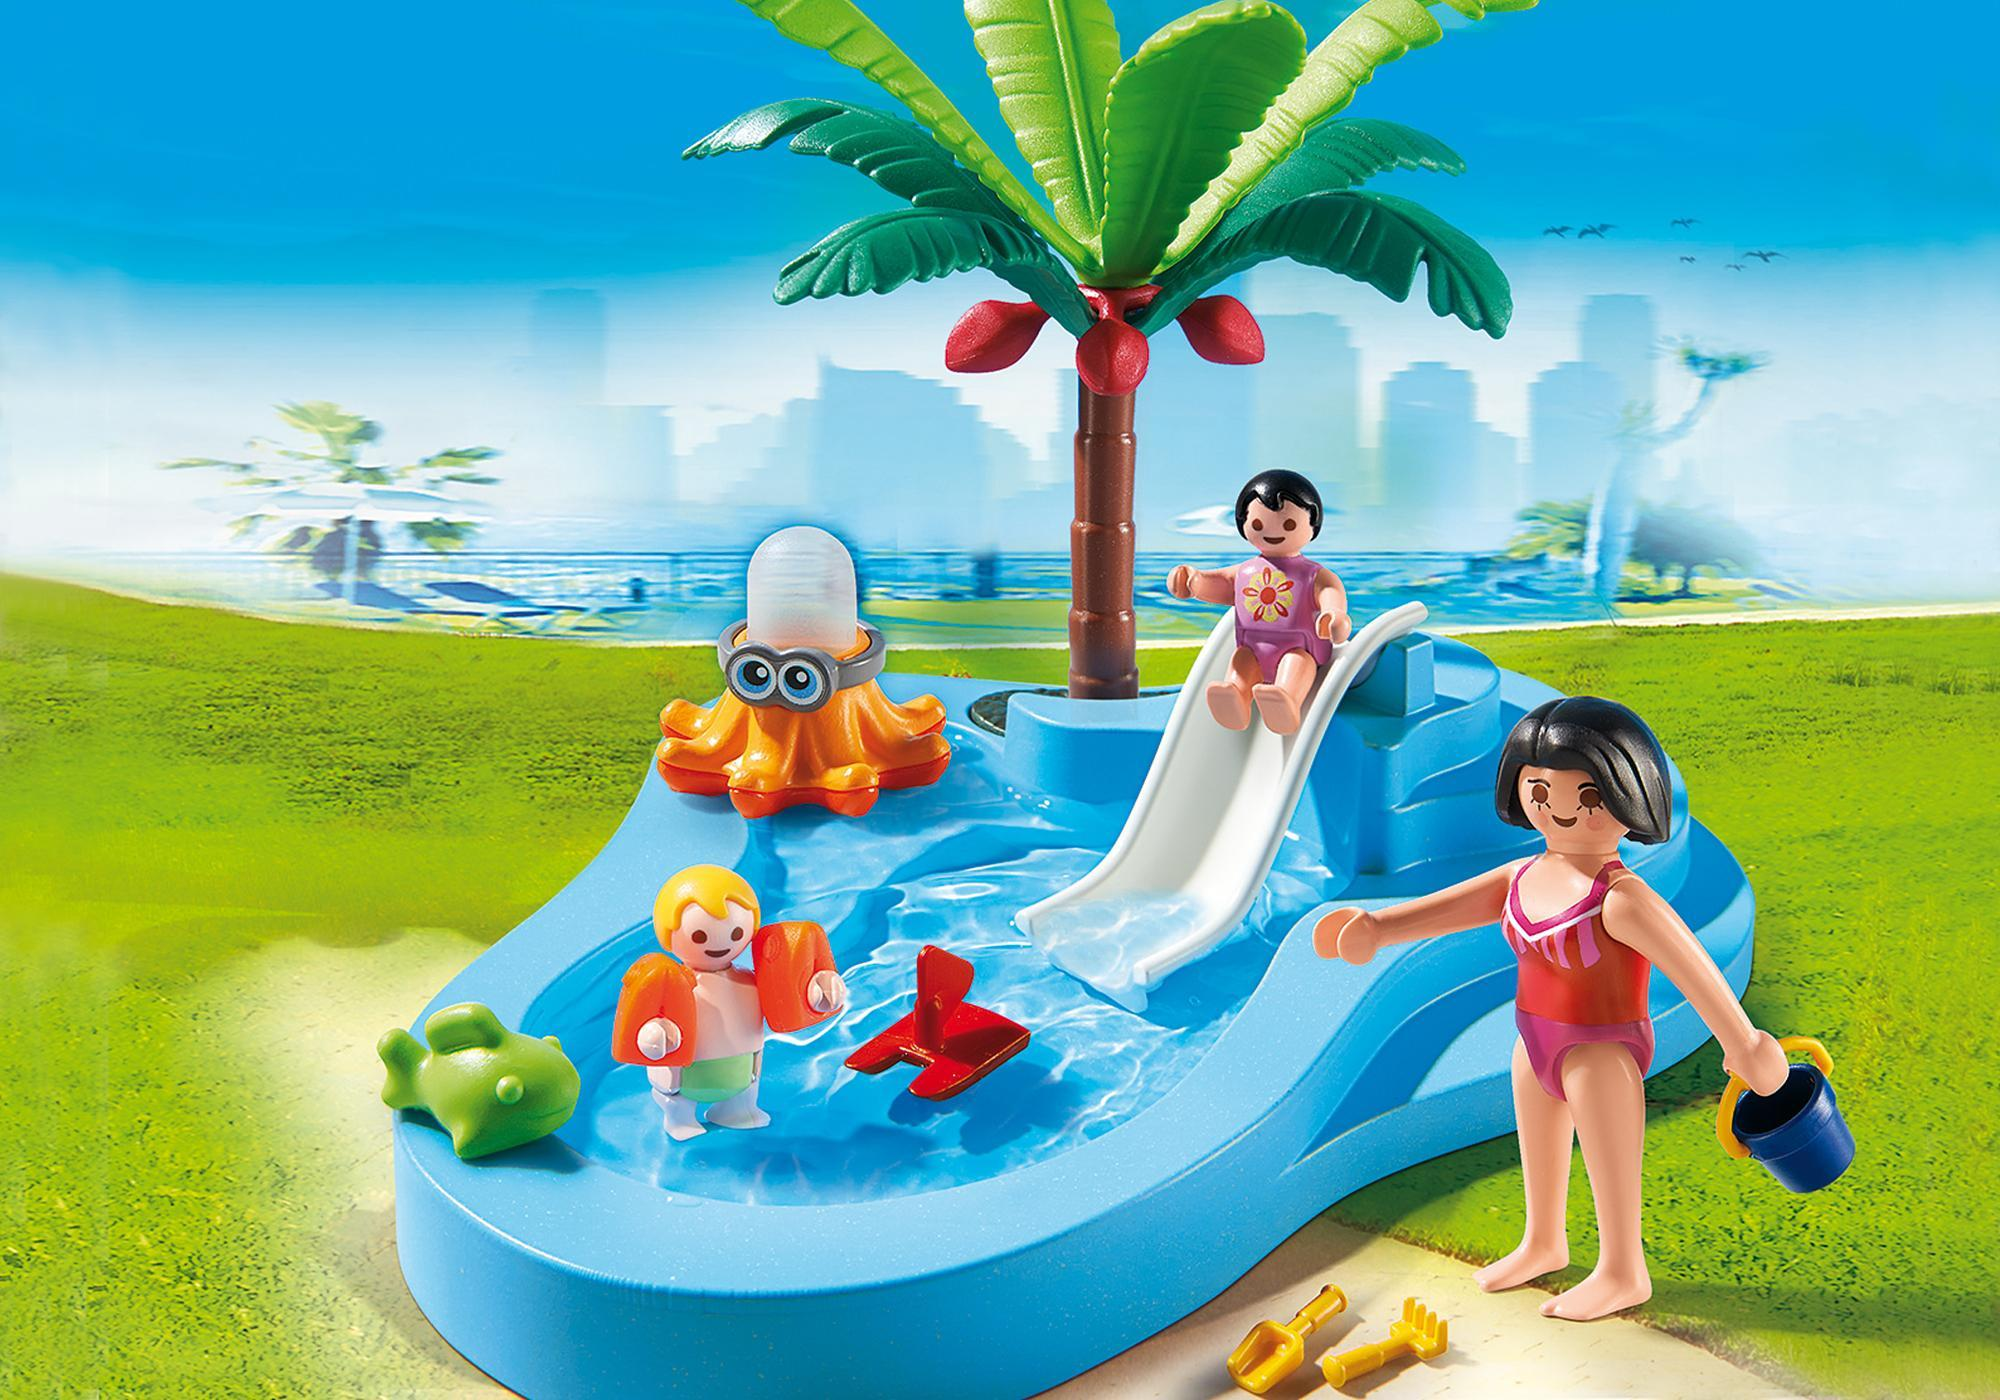 http://media.playmobil.com/i/playmobil/6673_product_detail/Bassin pour bébés et mini-toboggan